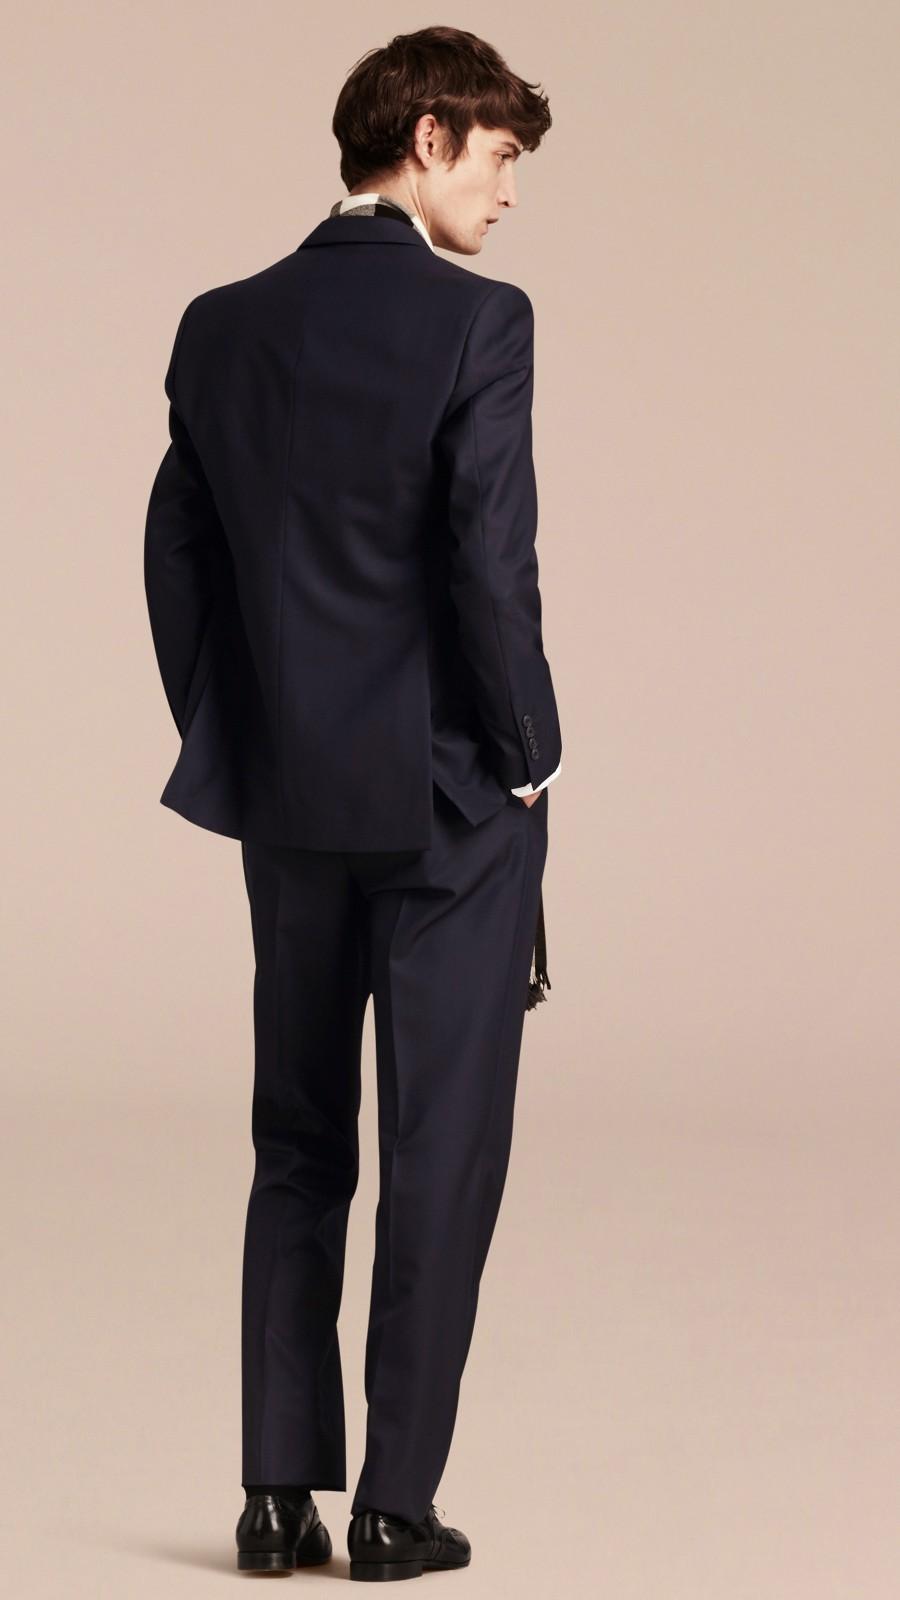 Navy Classic Fit Wool Part-canvas Suit Navy - Image 3